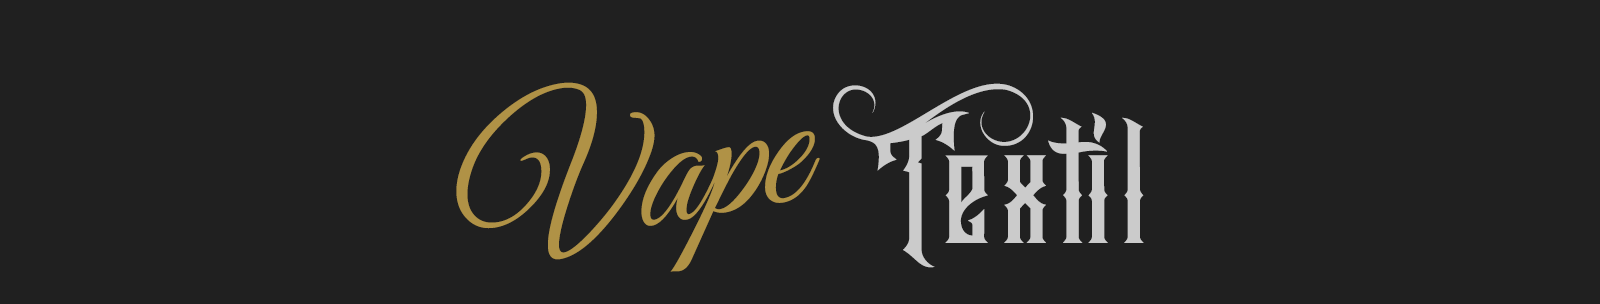 vape textil header